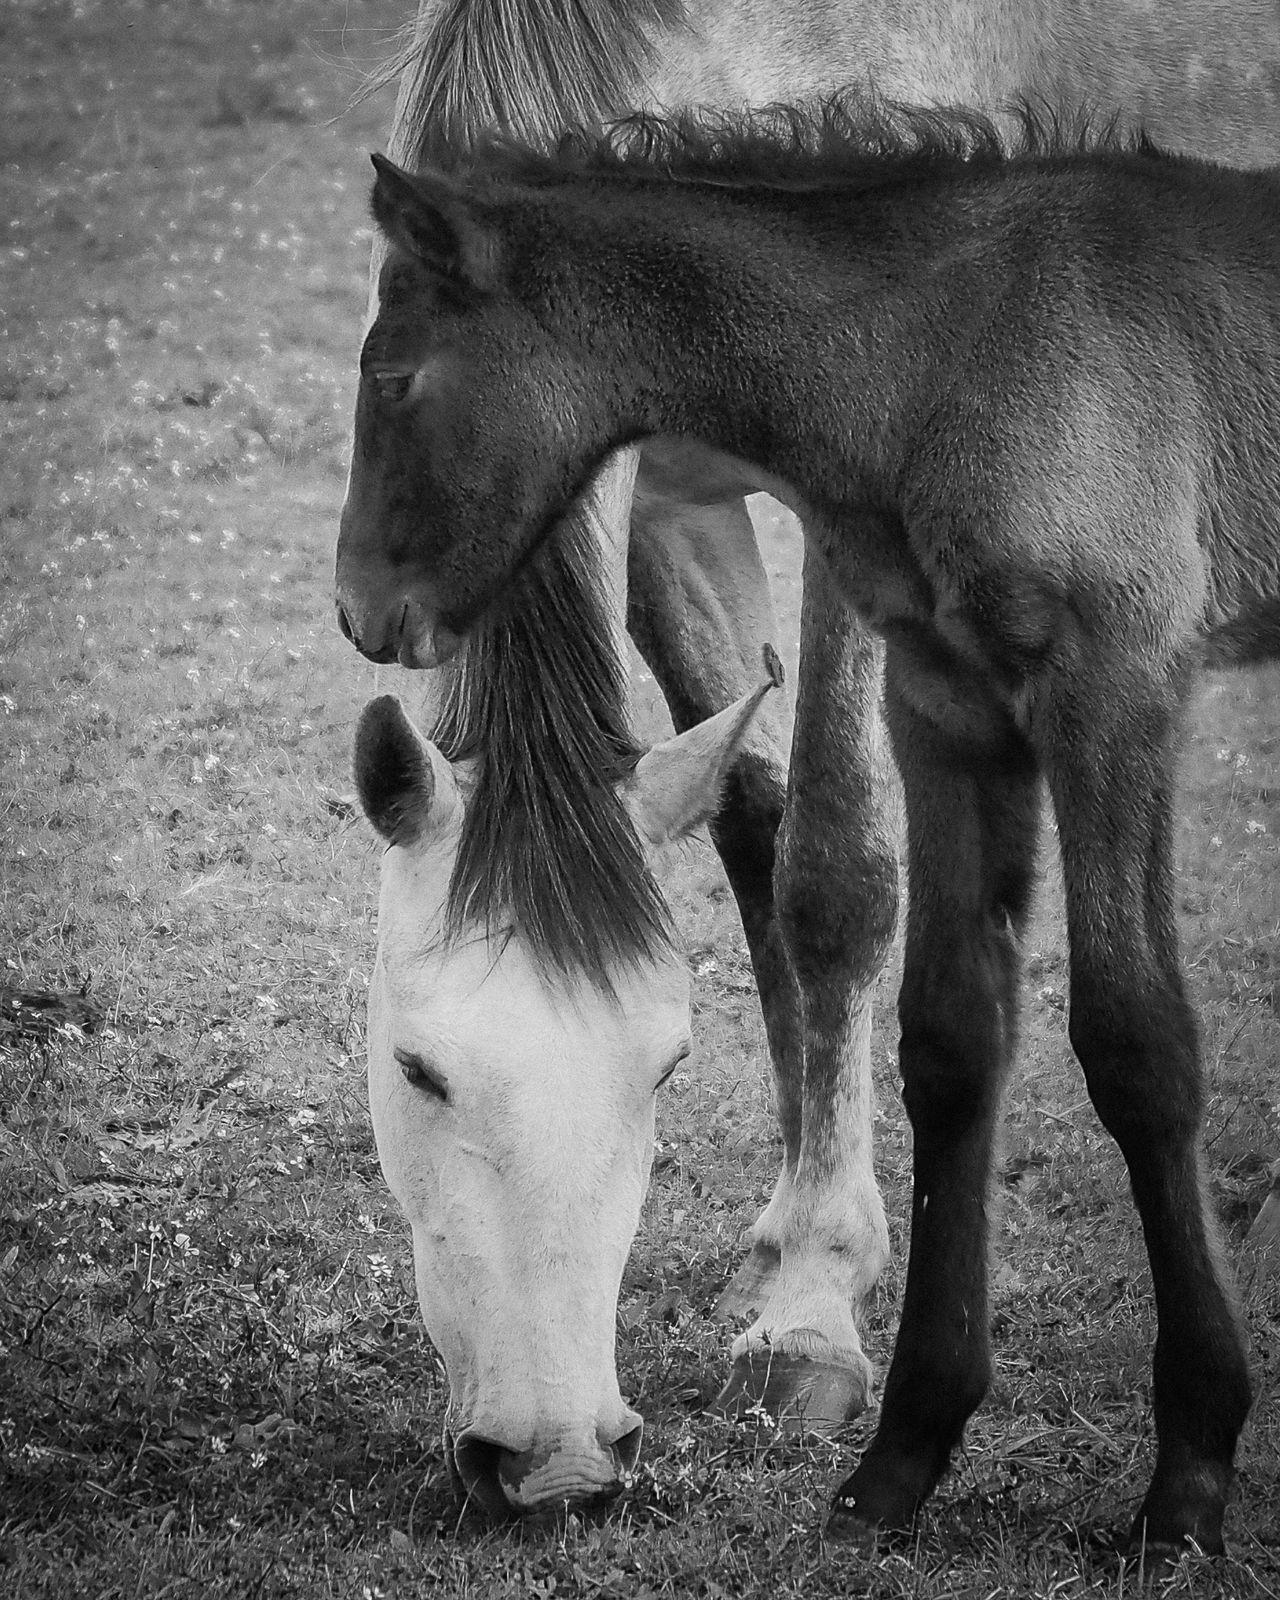 Alentejo Blackandwhite Countryside Getting Inspired GoingOut Horse Mirrorless Nature Omdem5 Outdoors Portugal Portugaldenorteasul Terapy Évora